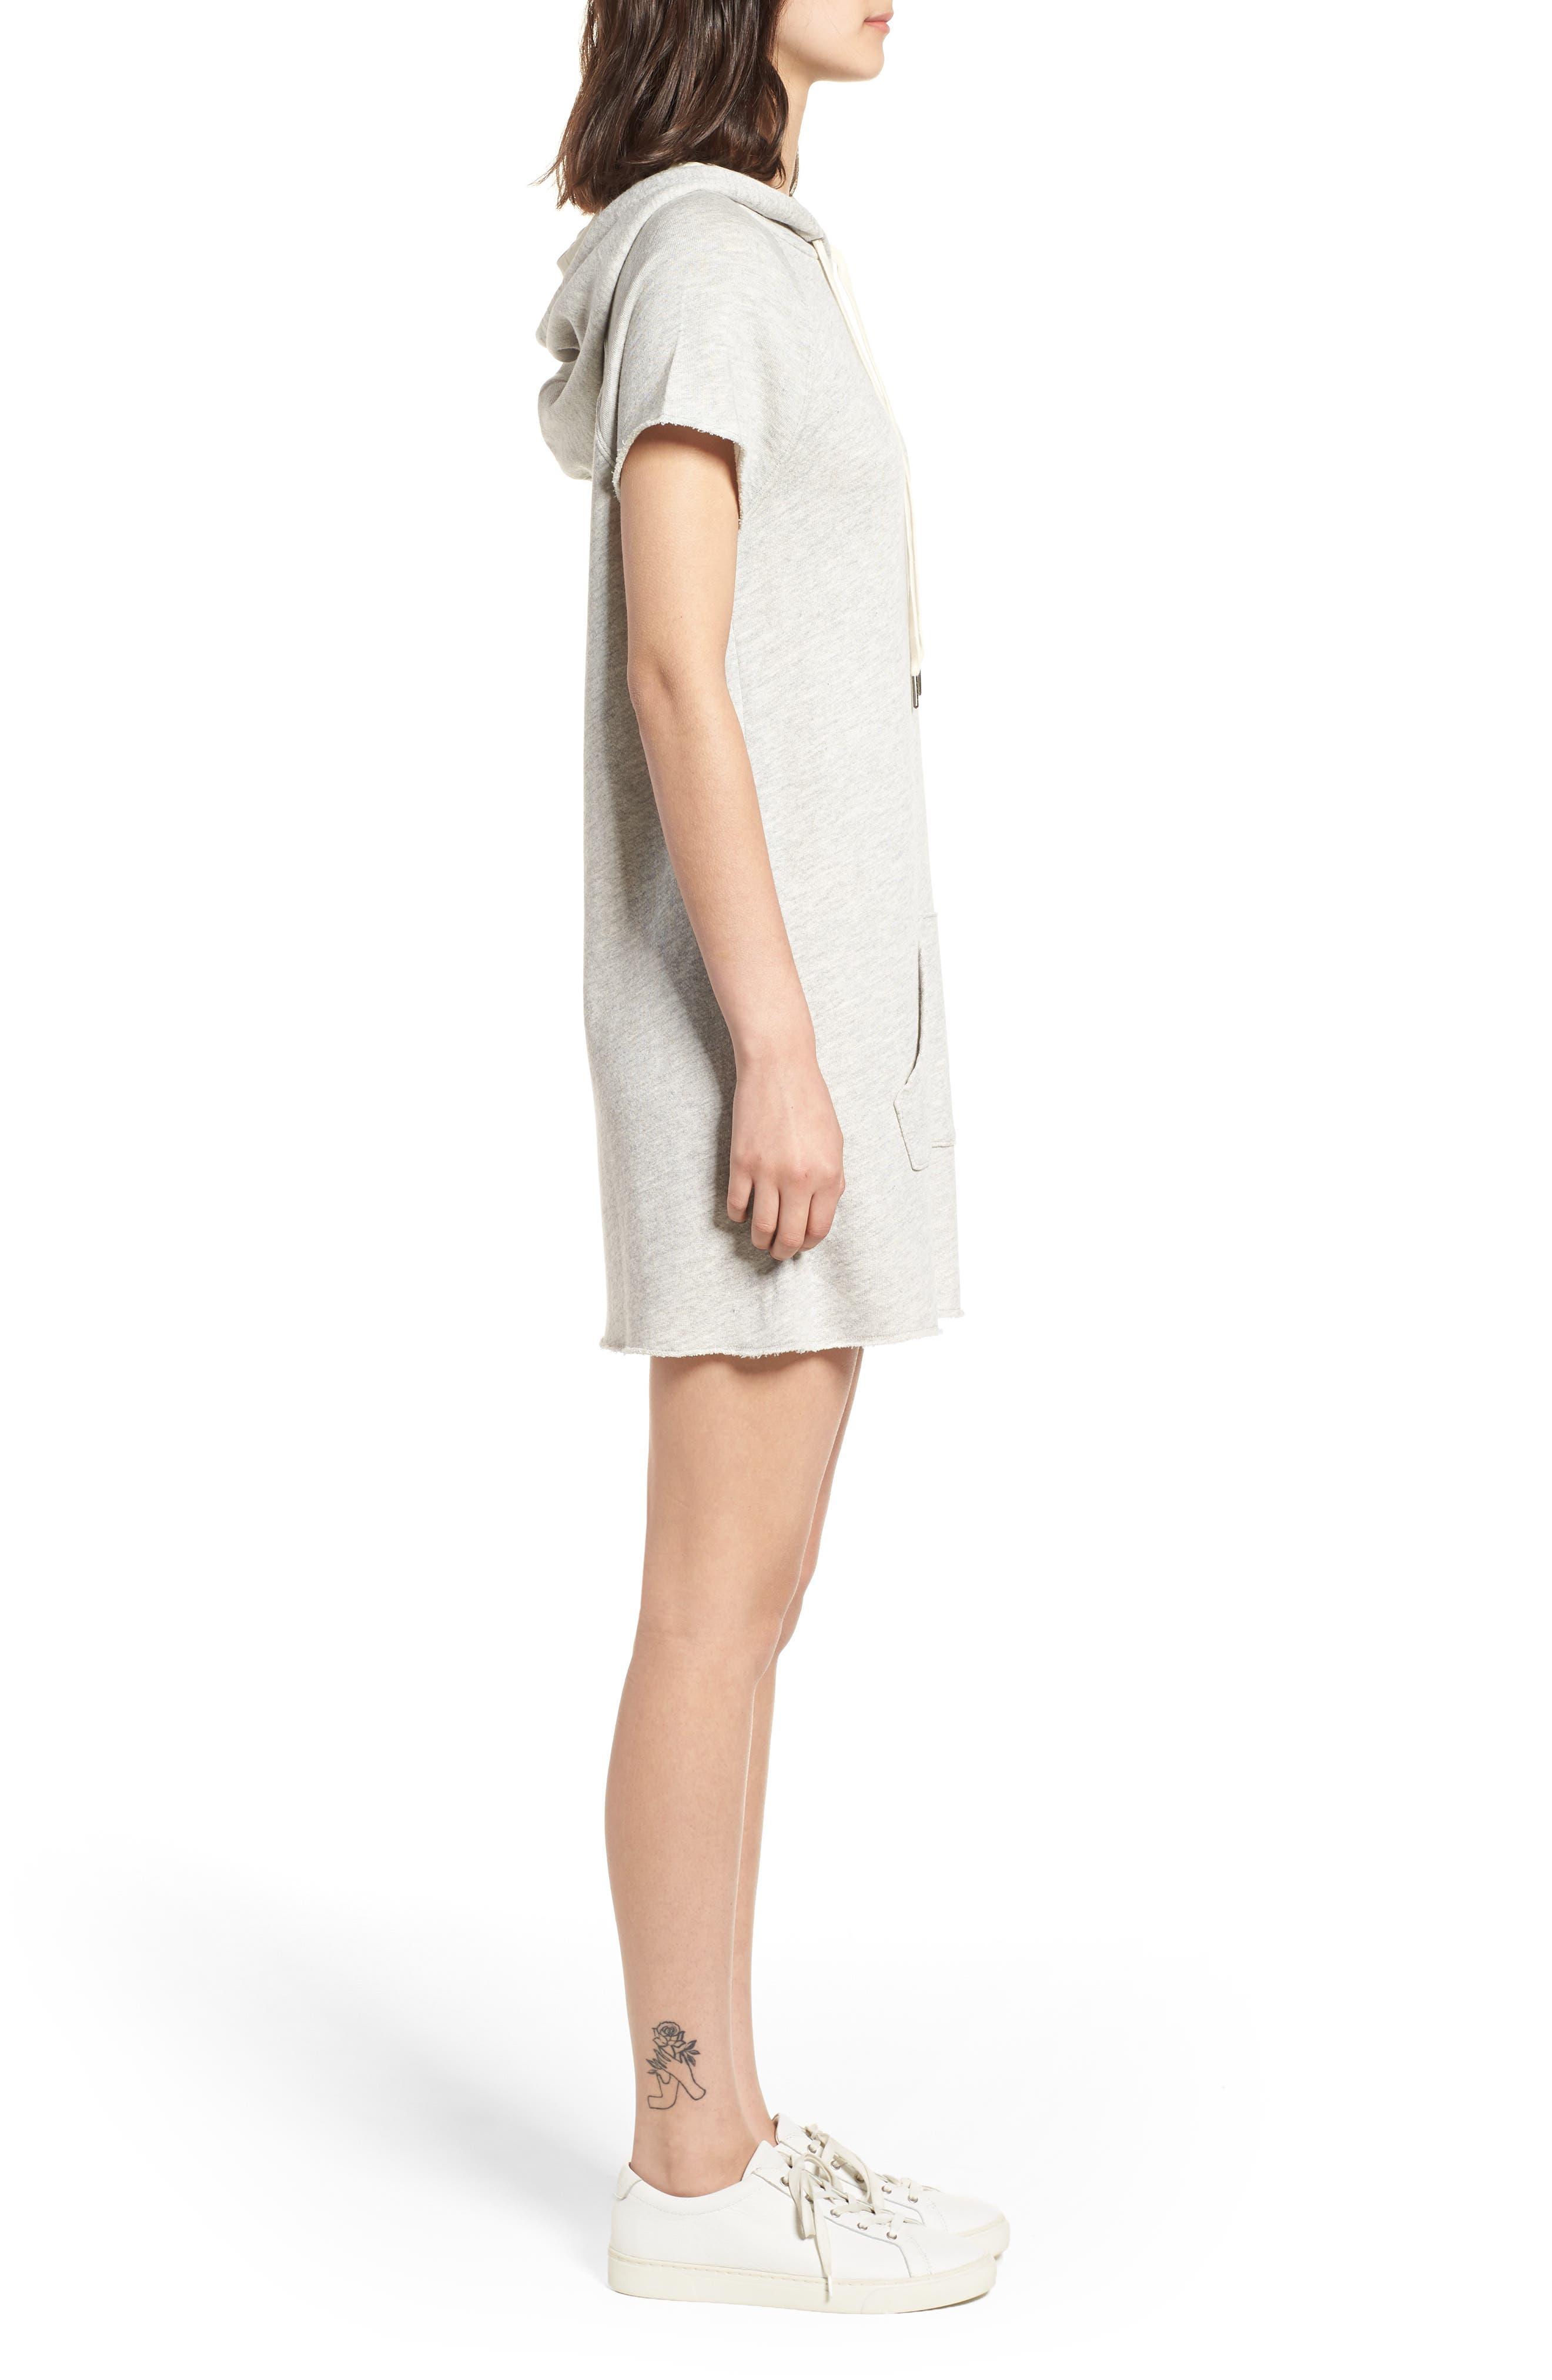 Spades Hoodie Dress,                             Alternate thumbnail 3, color,                             020